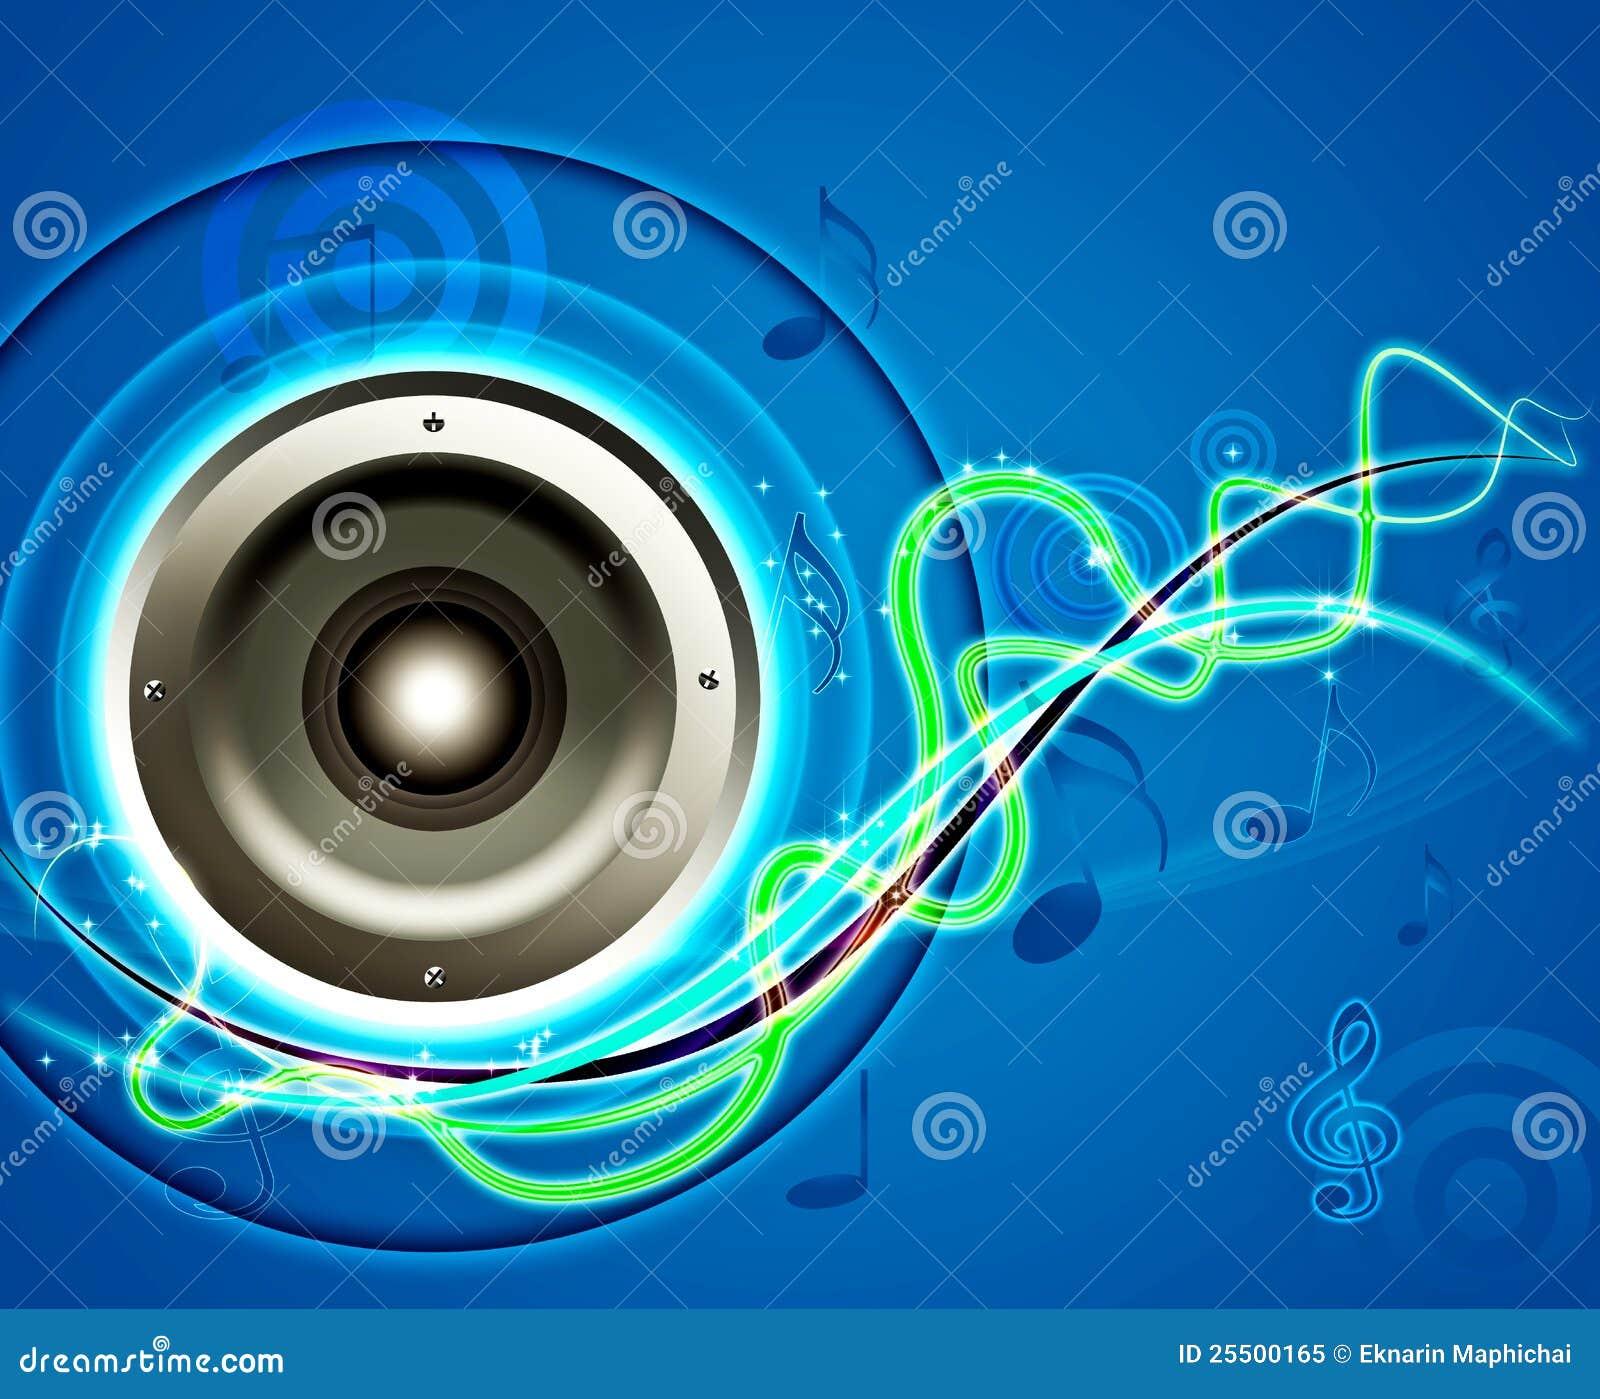 sound system design background royalty free stock photo image 25500165. Black Bedroom Furniture Sets. Home Design Ideas